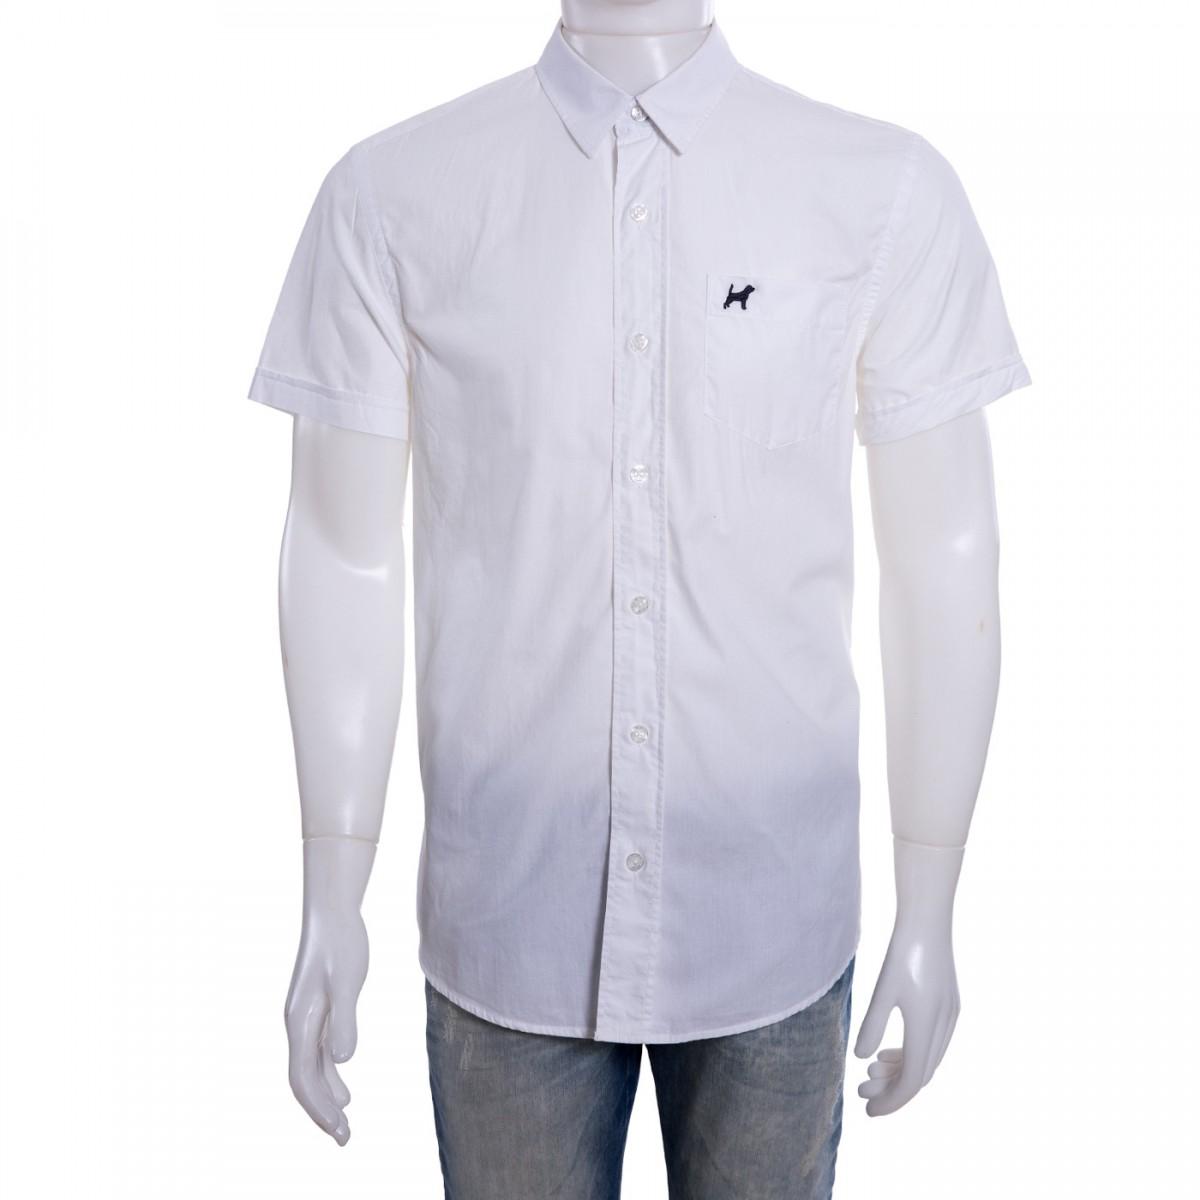 f42d644a0 Bizz Store - Camisa Social Masculina Beagle Manga Curta Branca